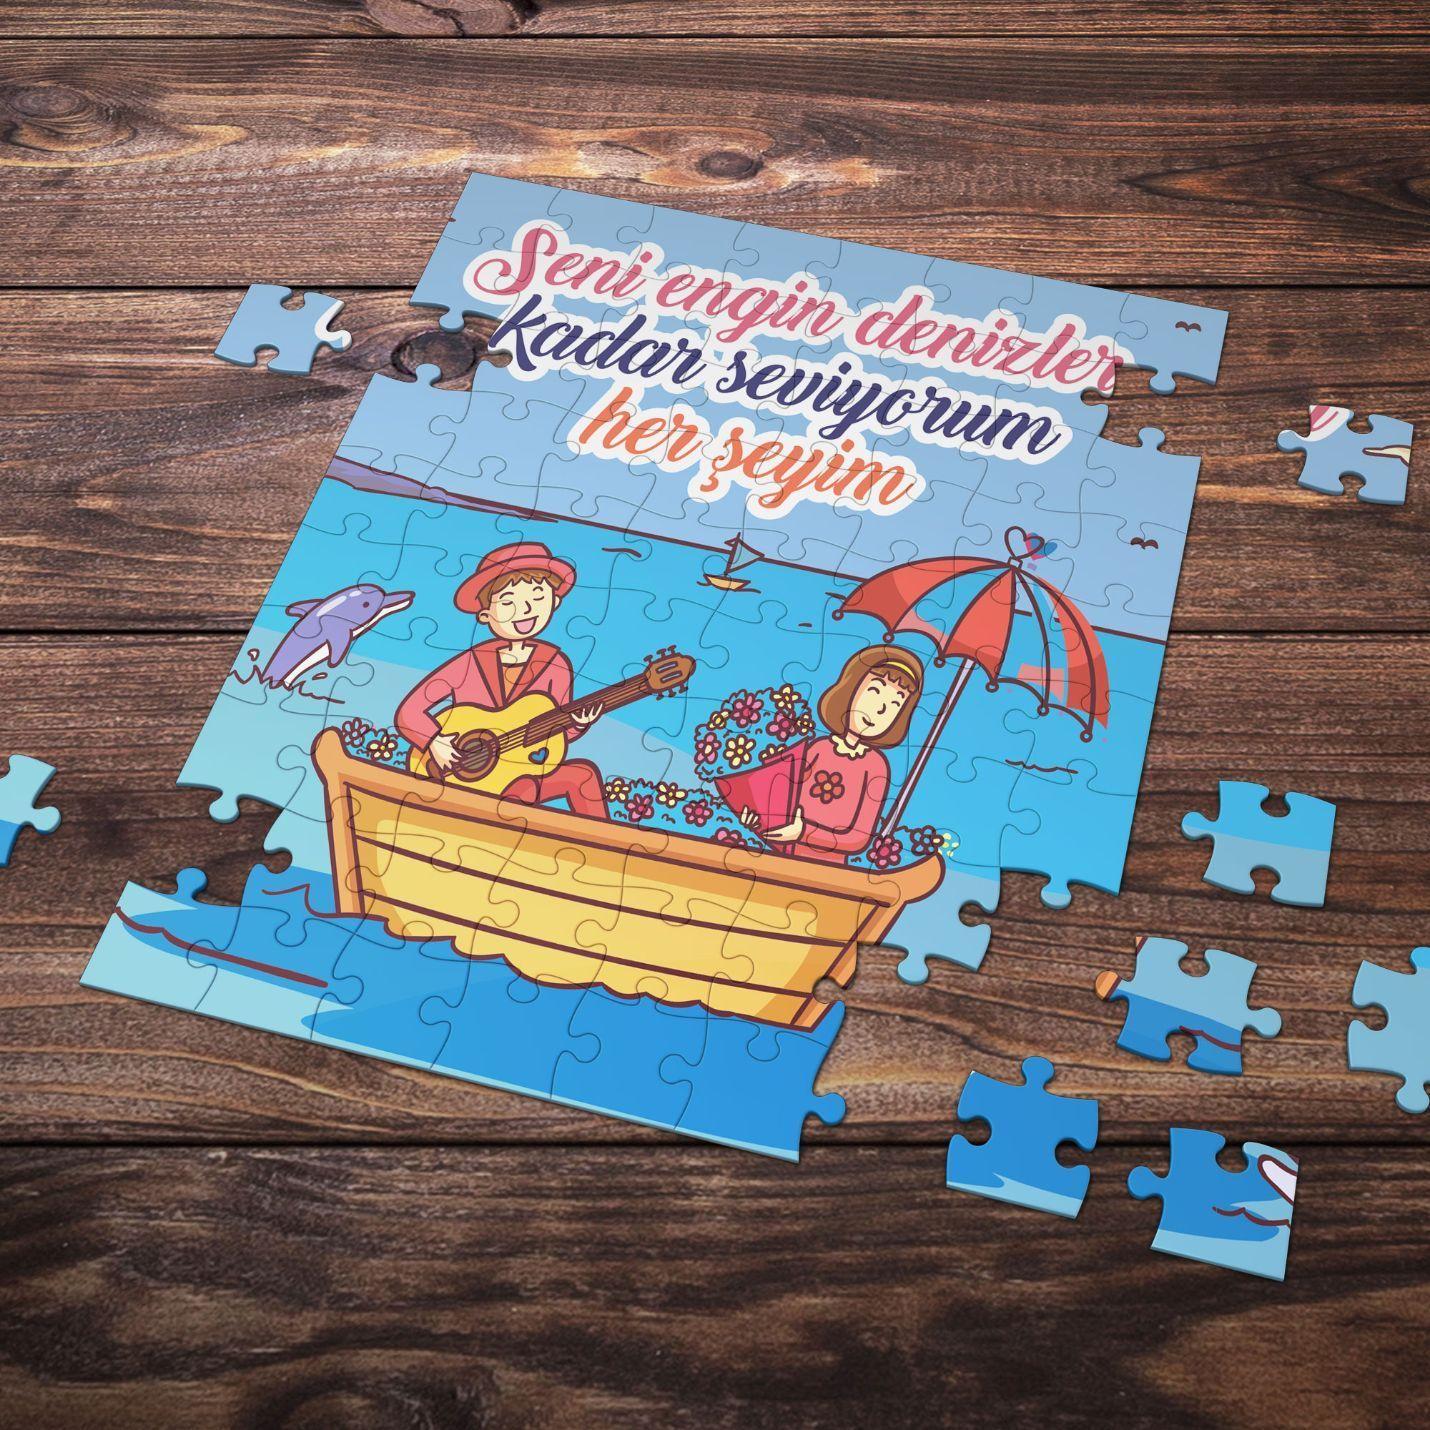 99 Parça Romantik Tasarımlı Puzzle Yapboz No15